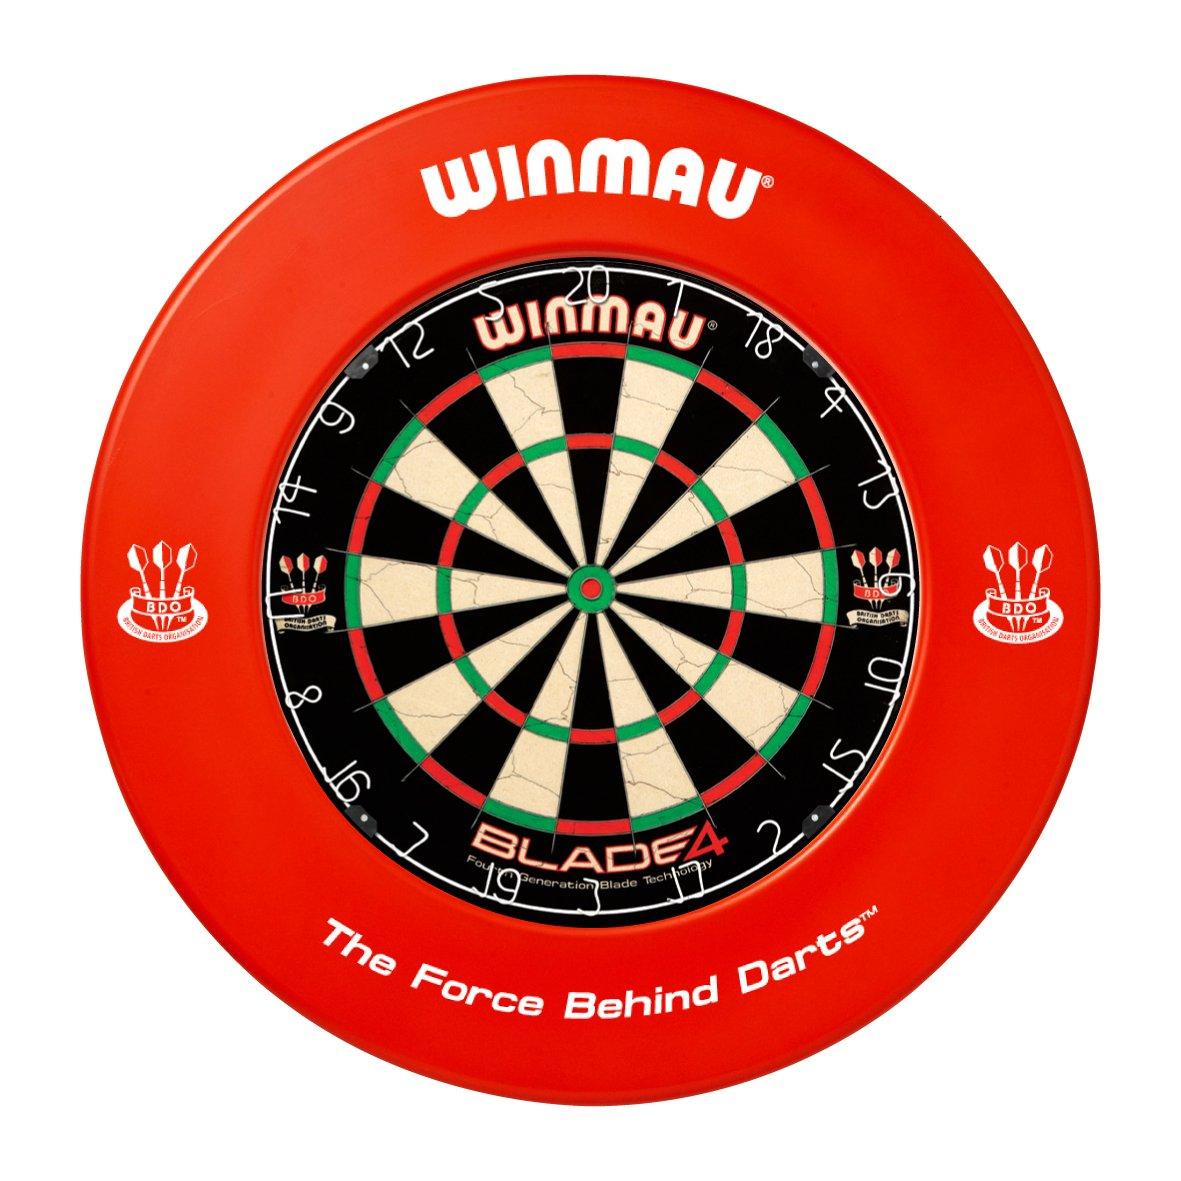 WINMAU RED DARTBOARD SURROUND RUBBER RING